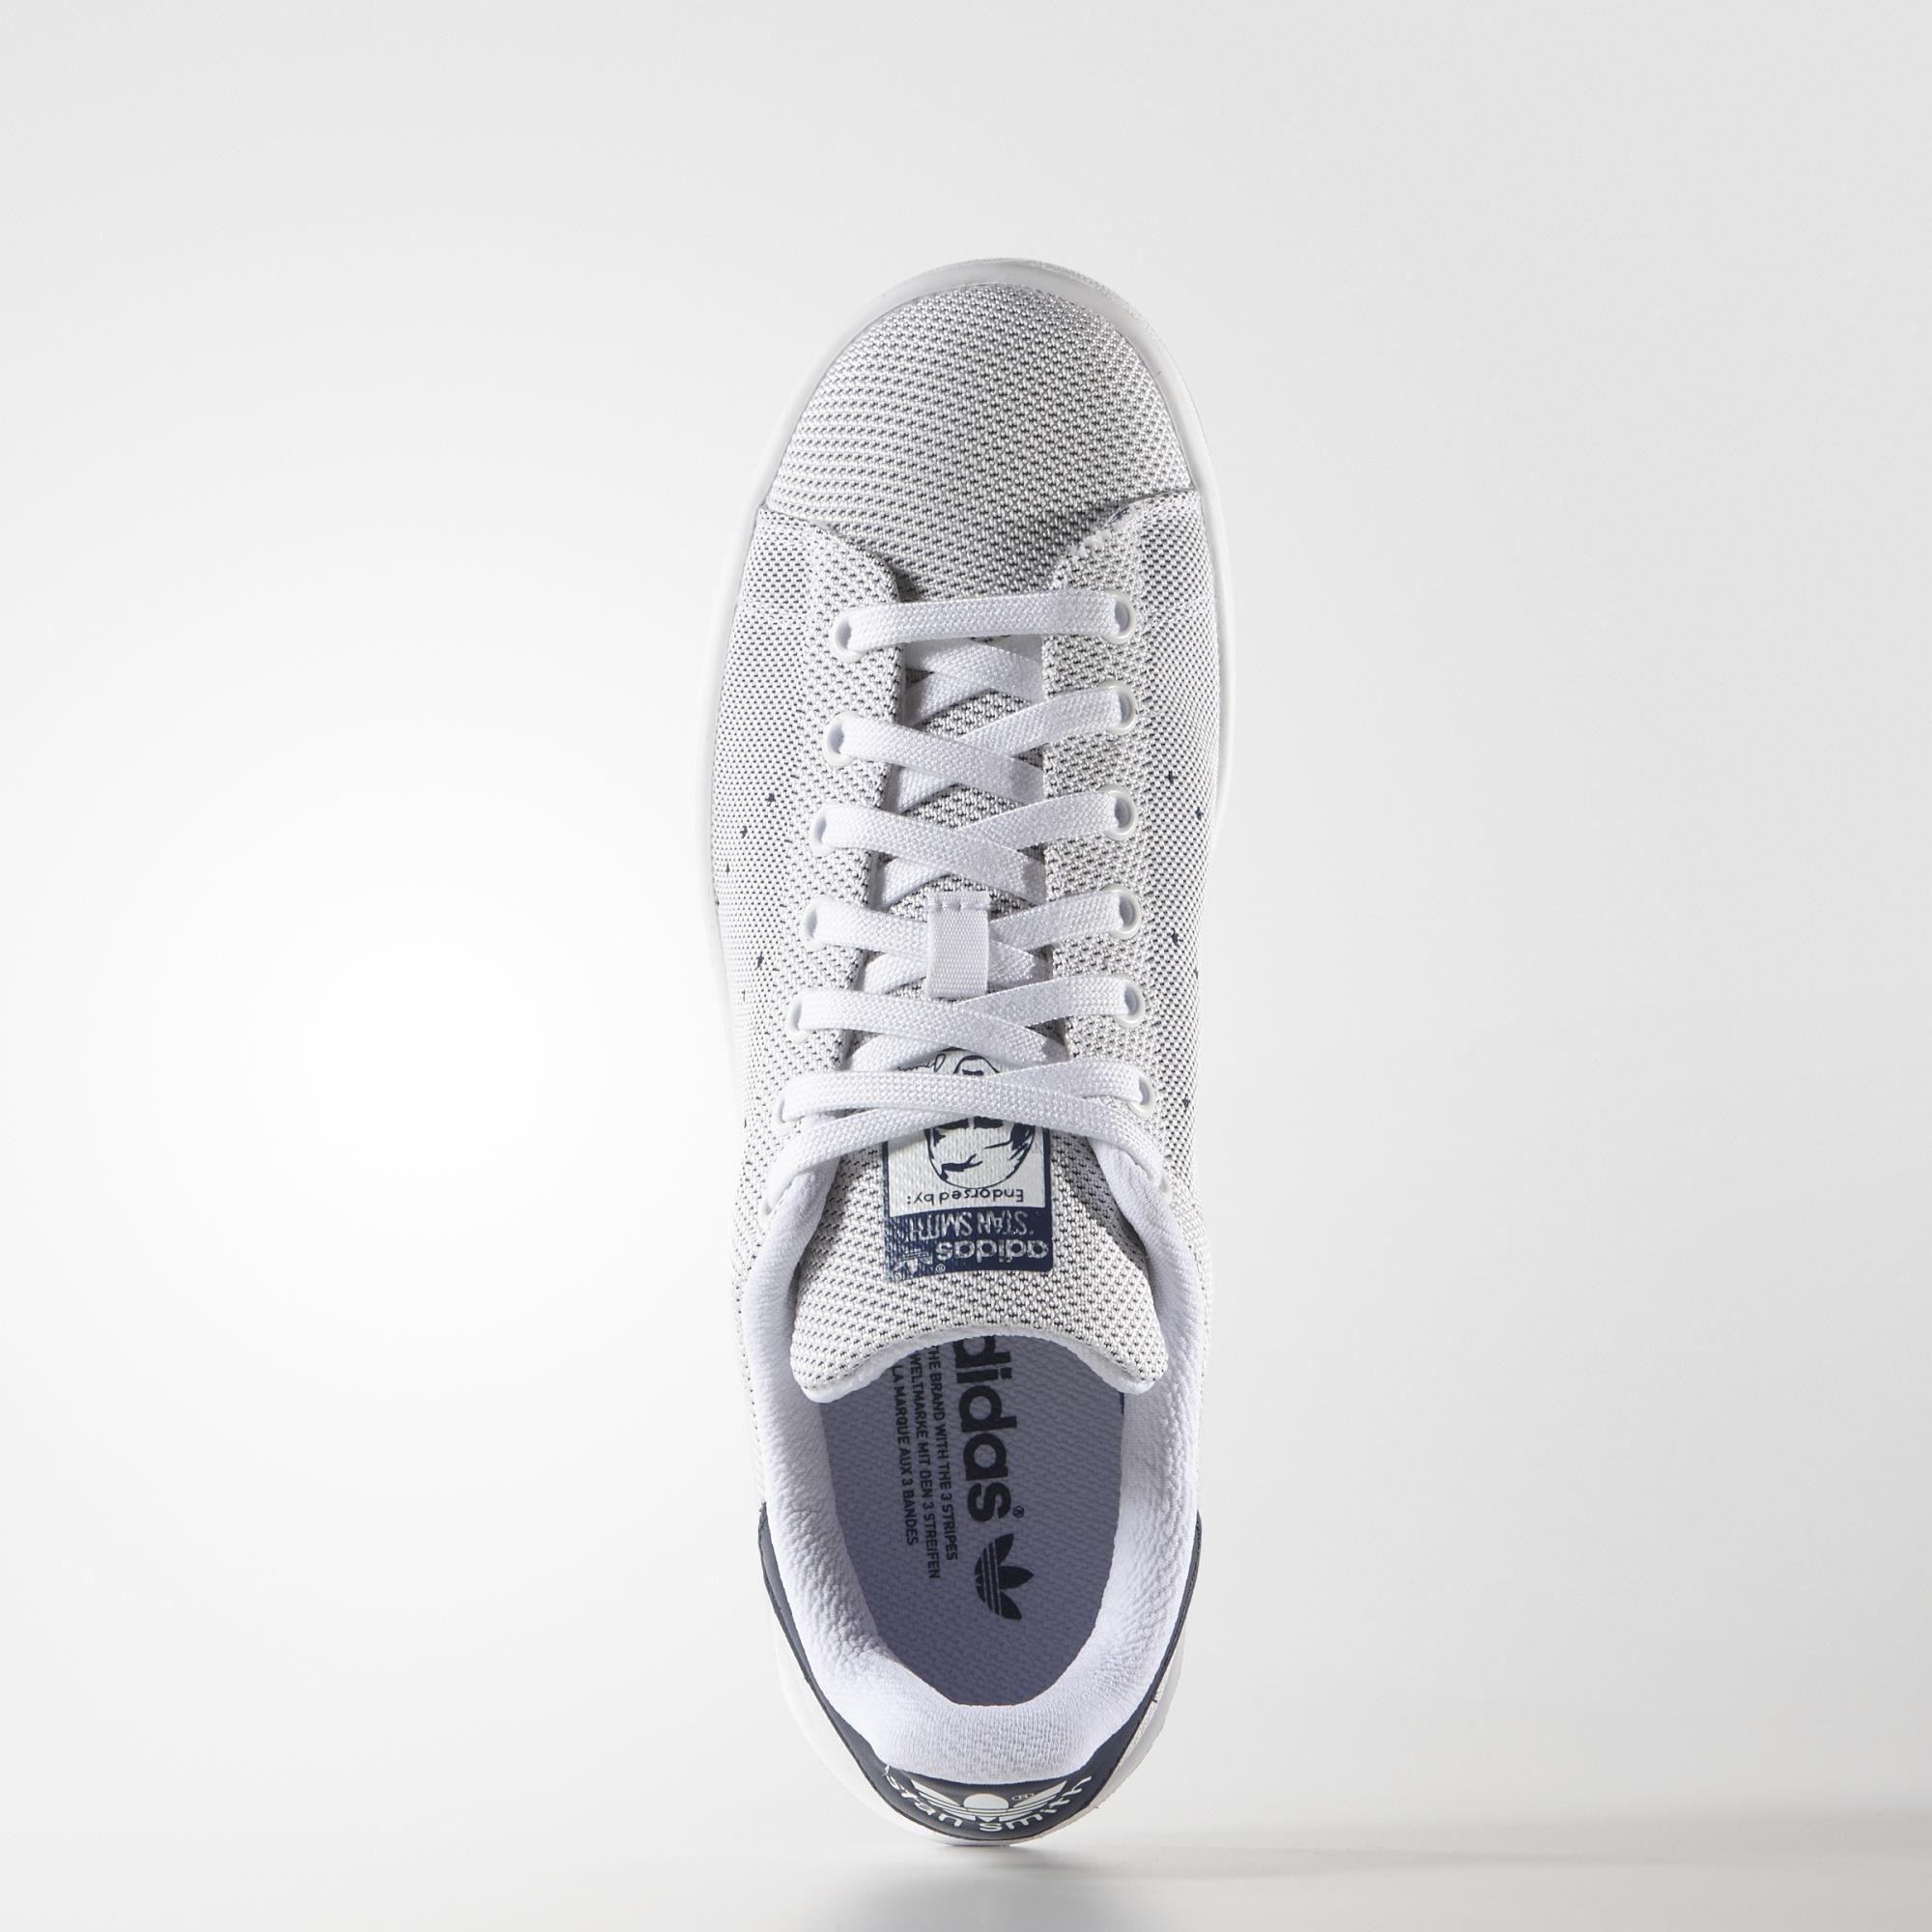 san francisco 94a37 e723a Stan Smith Shoes | FASHION // Sneakers | Stan smith shoes ...